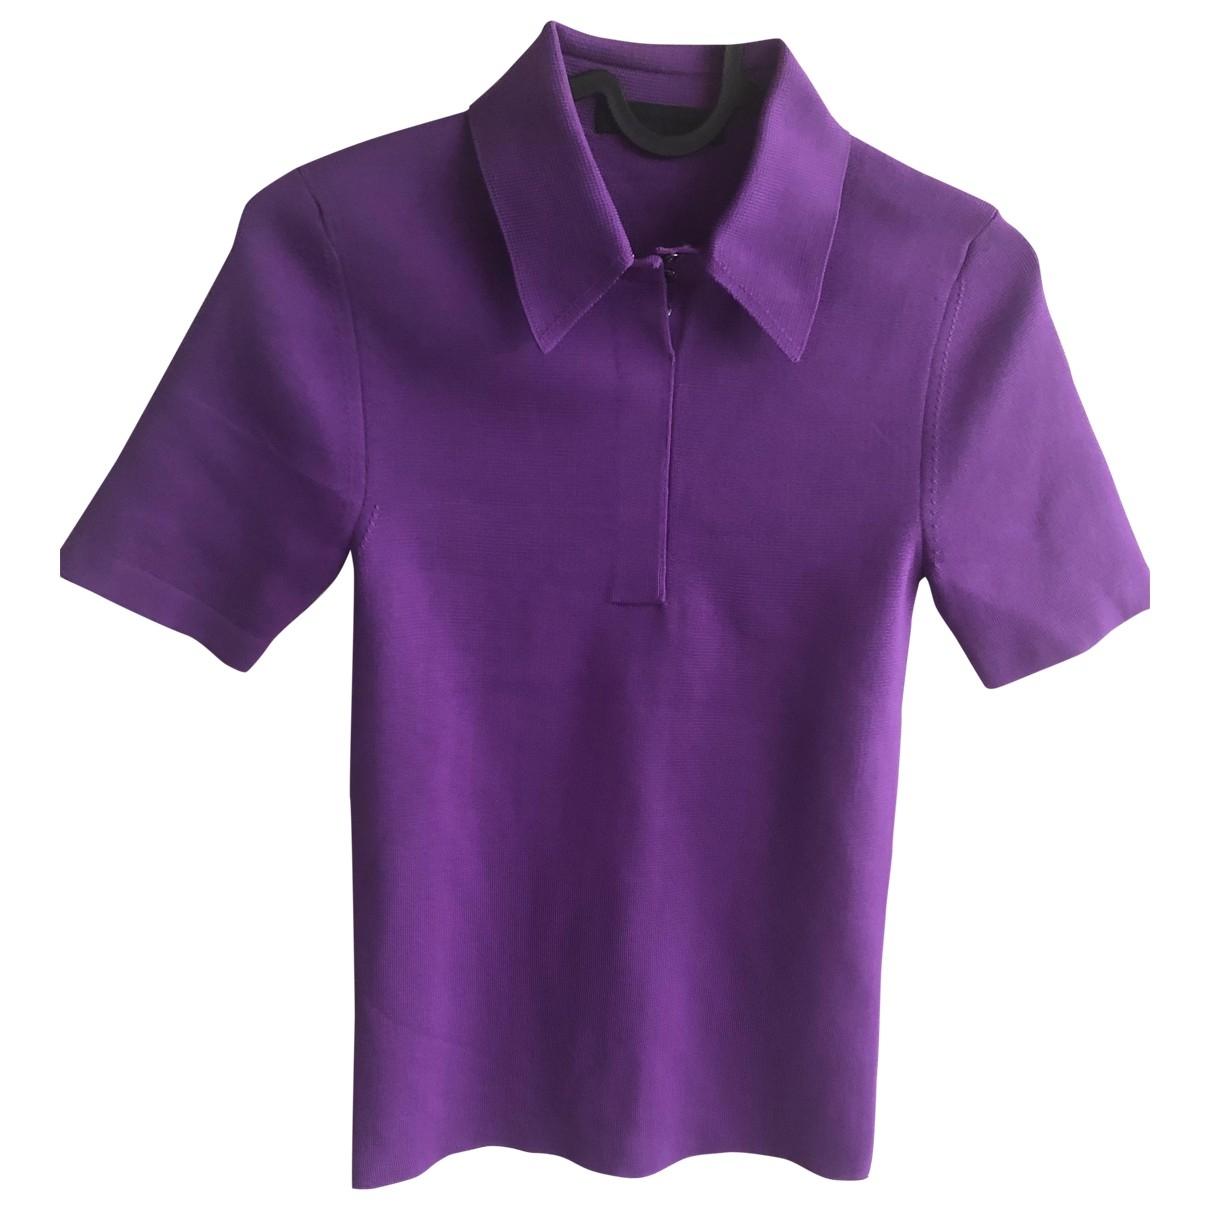 Alexander Wang \N Purple  top for Women S International